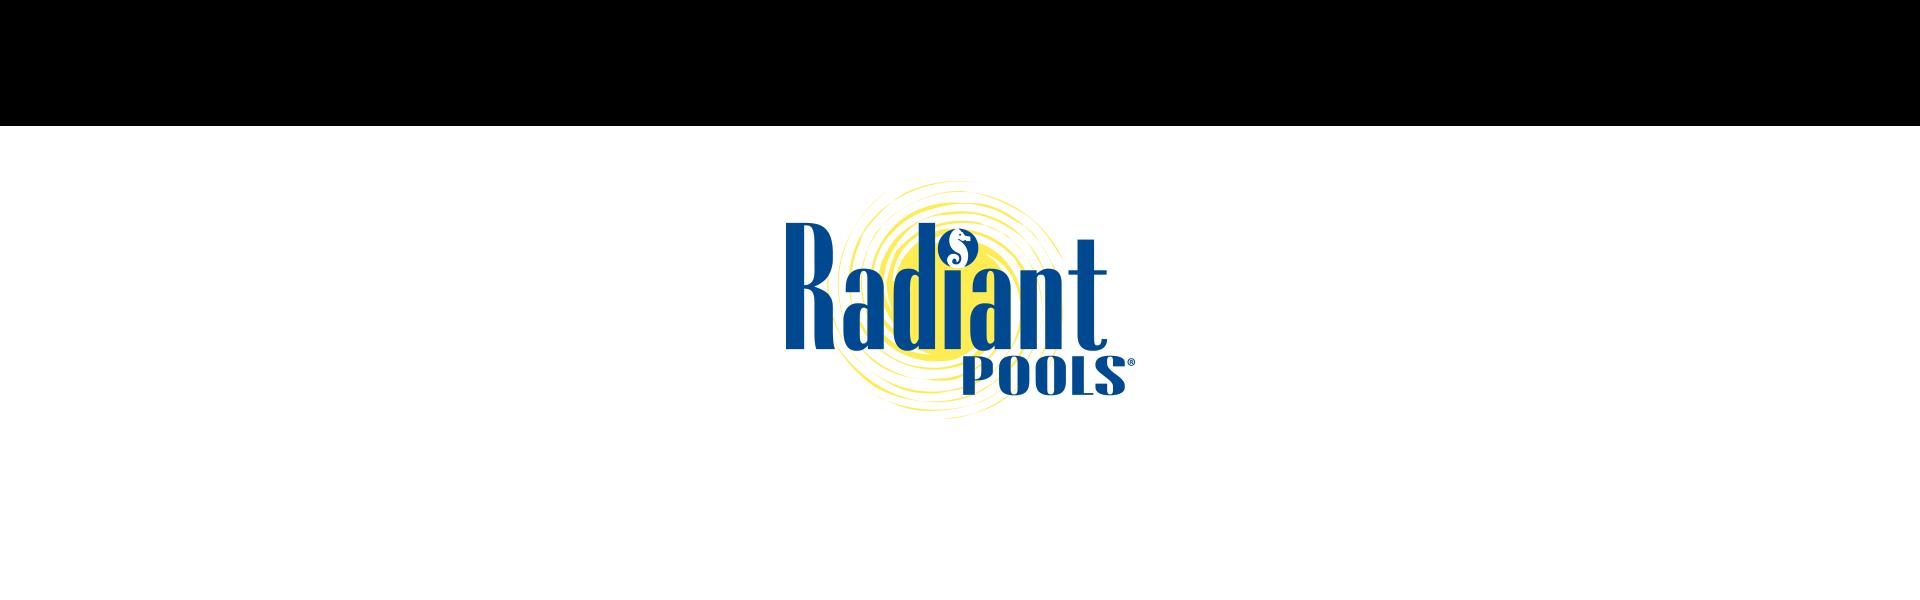 radiant-title-logo